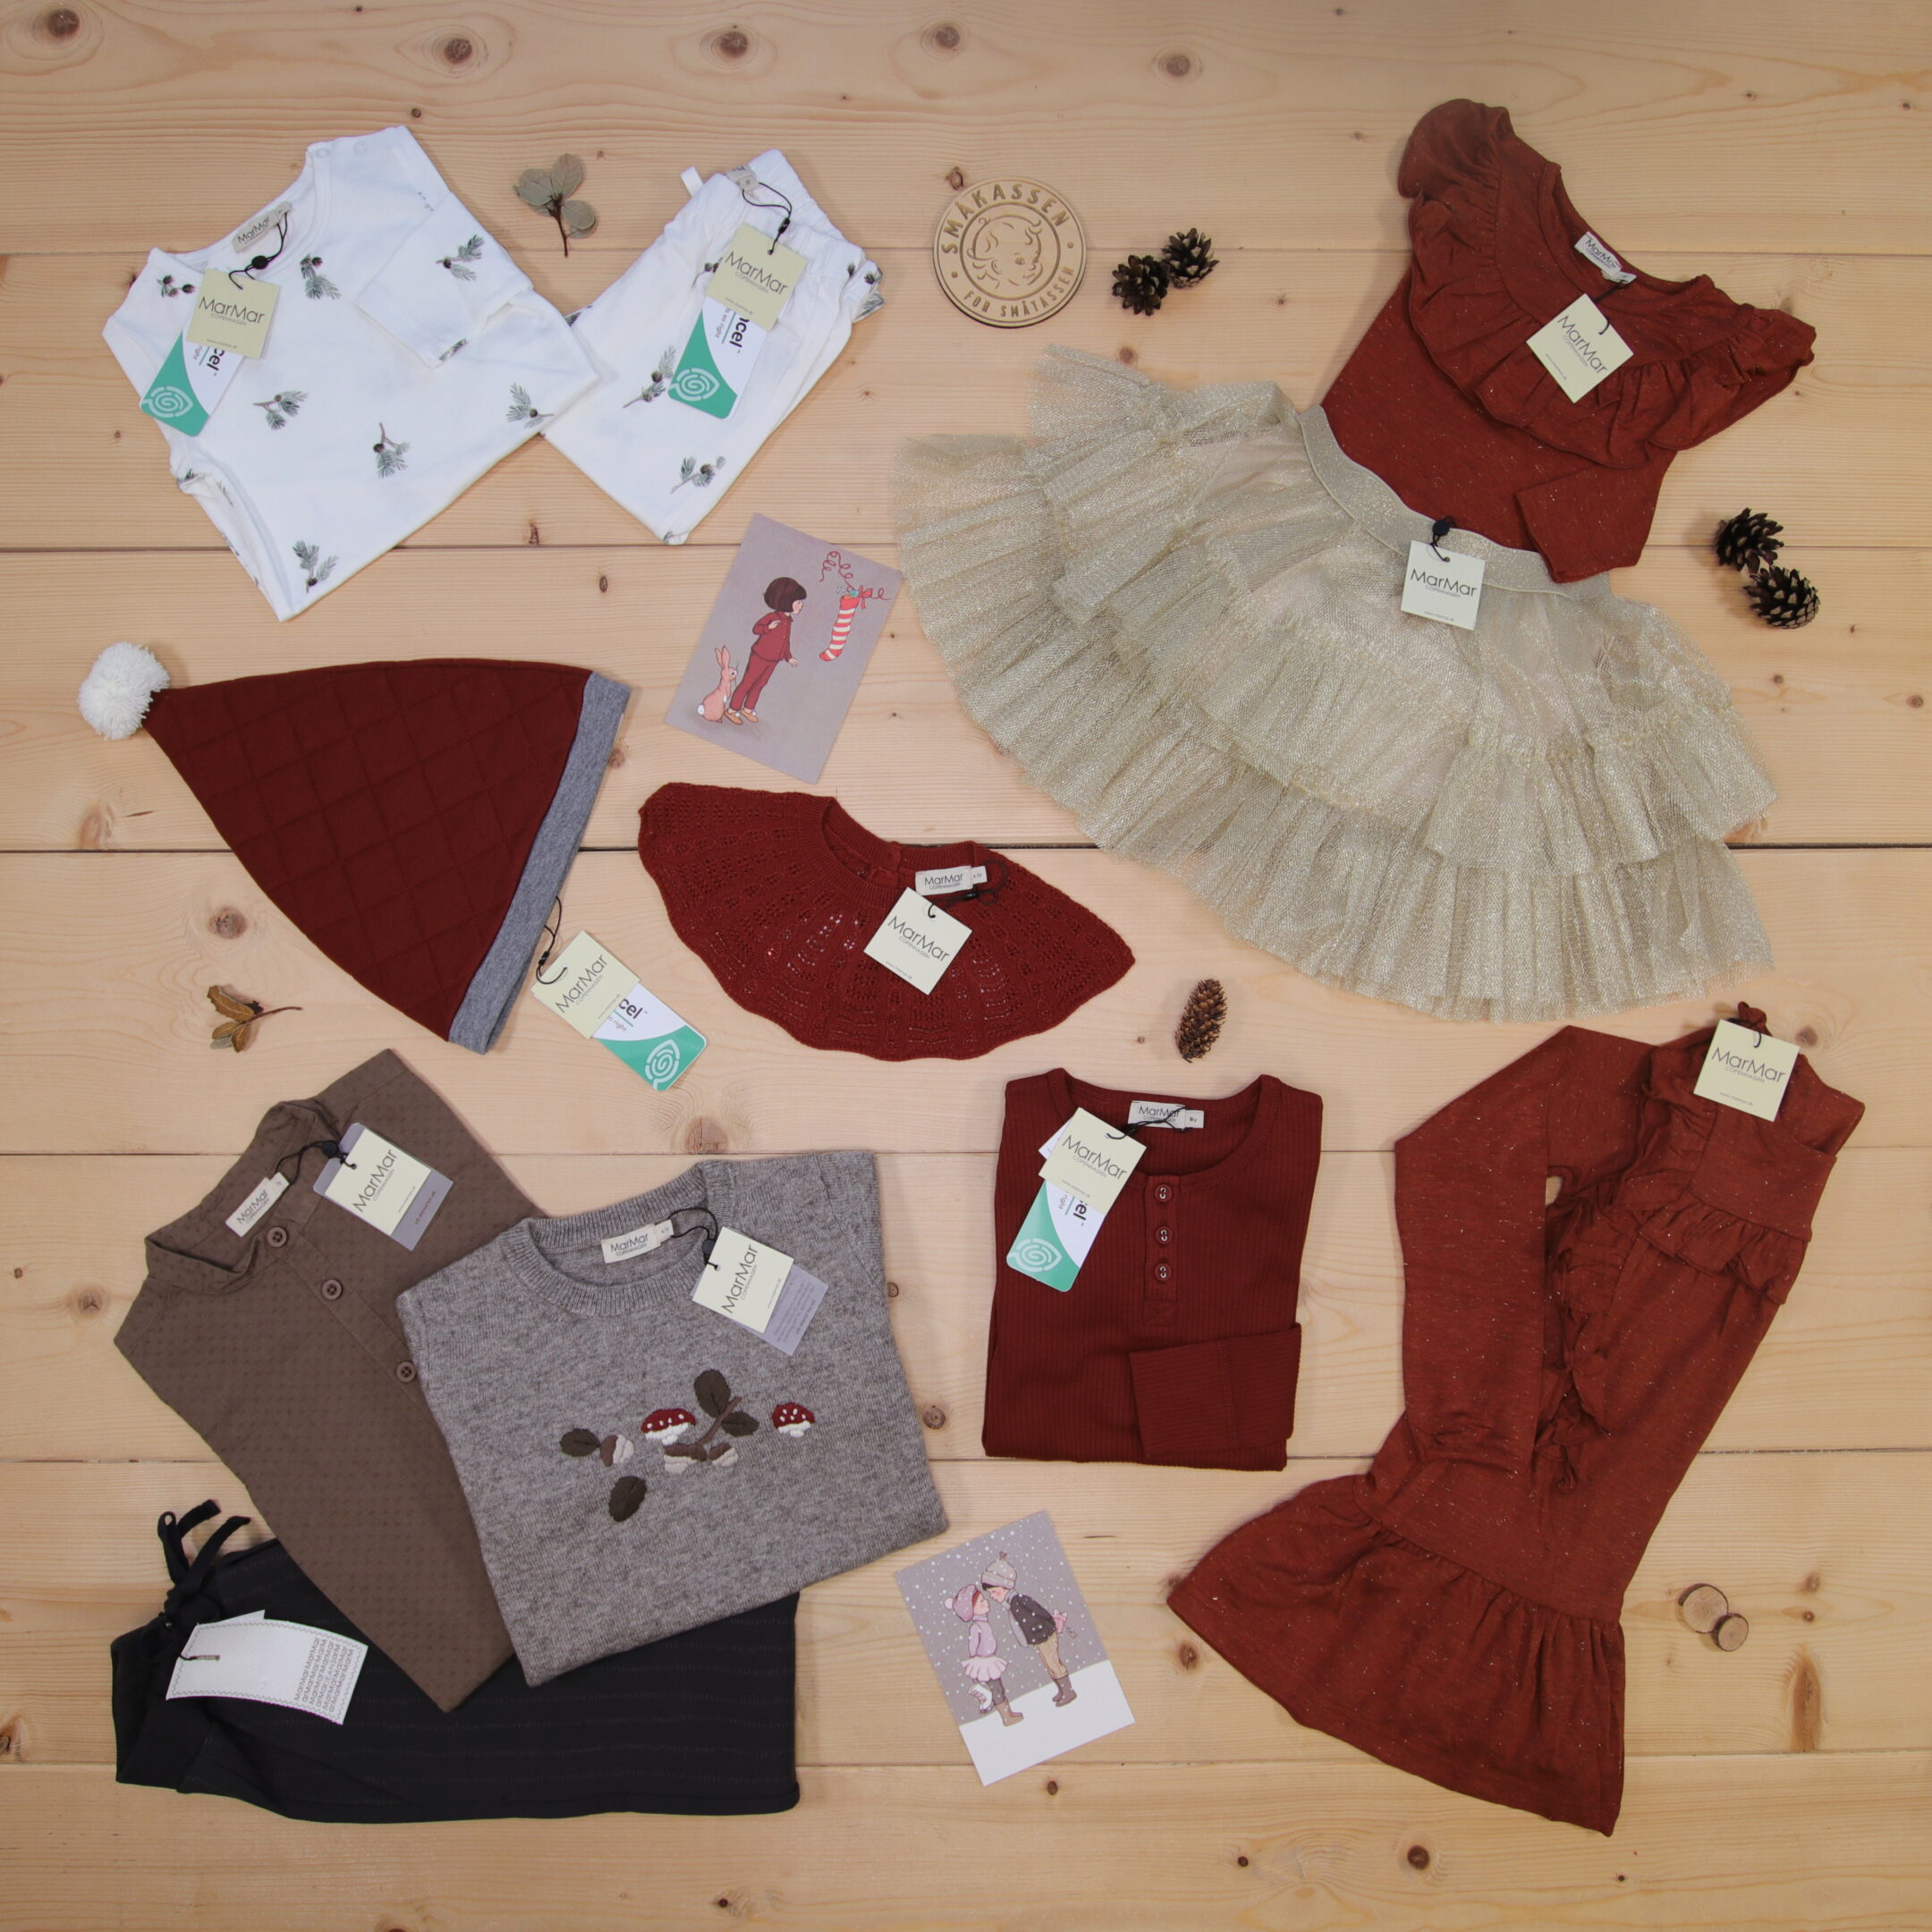 Only two months until Christmas 🎅 Check out these wonderful holiday season outfits from MarMar 🎄🎁  Dette er Småpakke som vi forberedte for en jente i stilene cute og cool